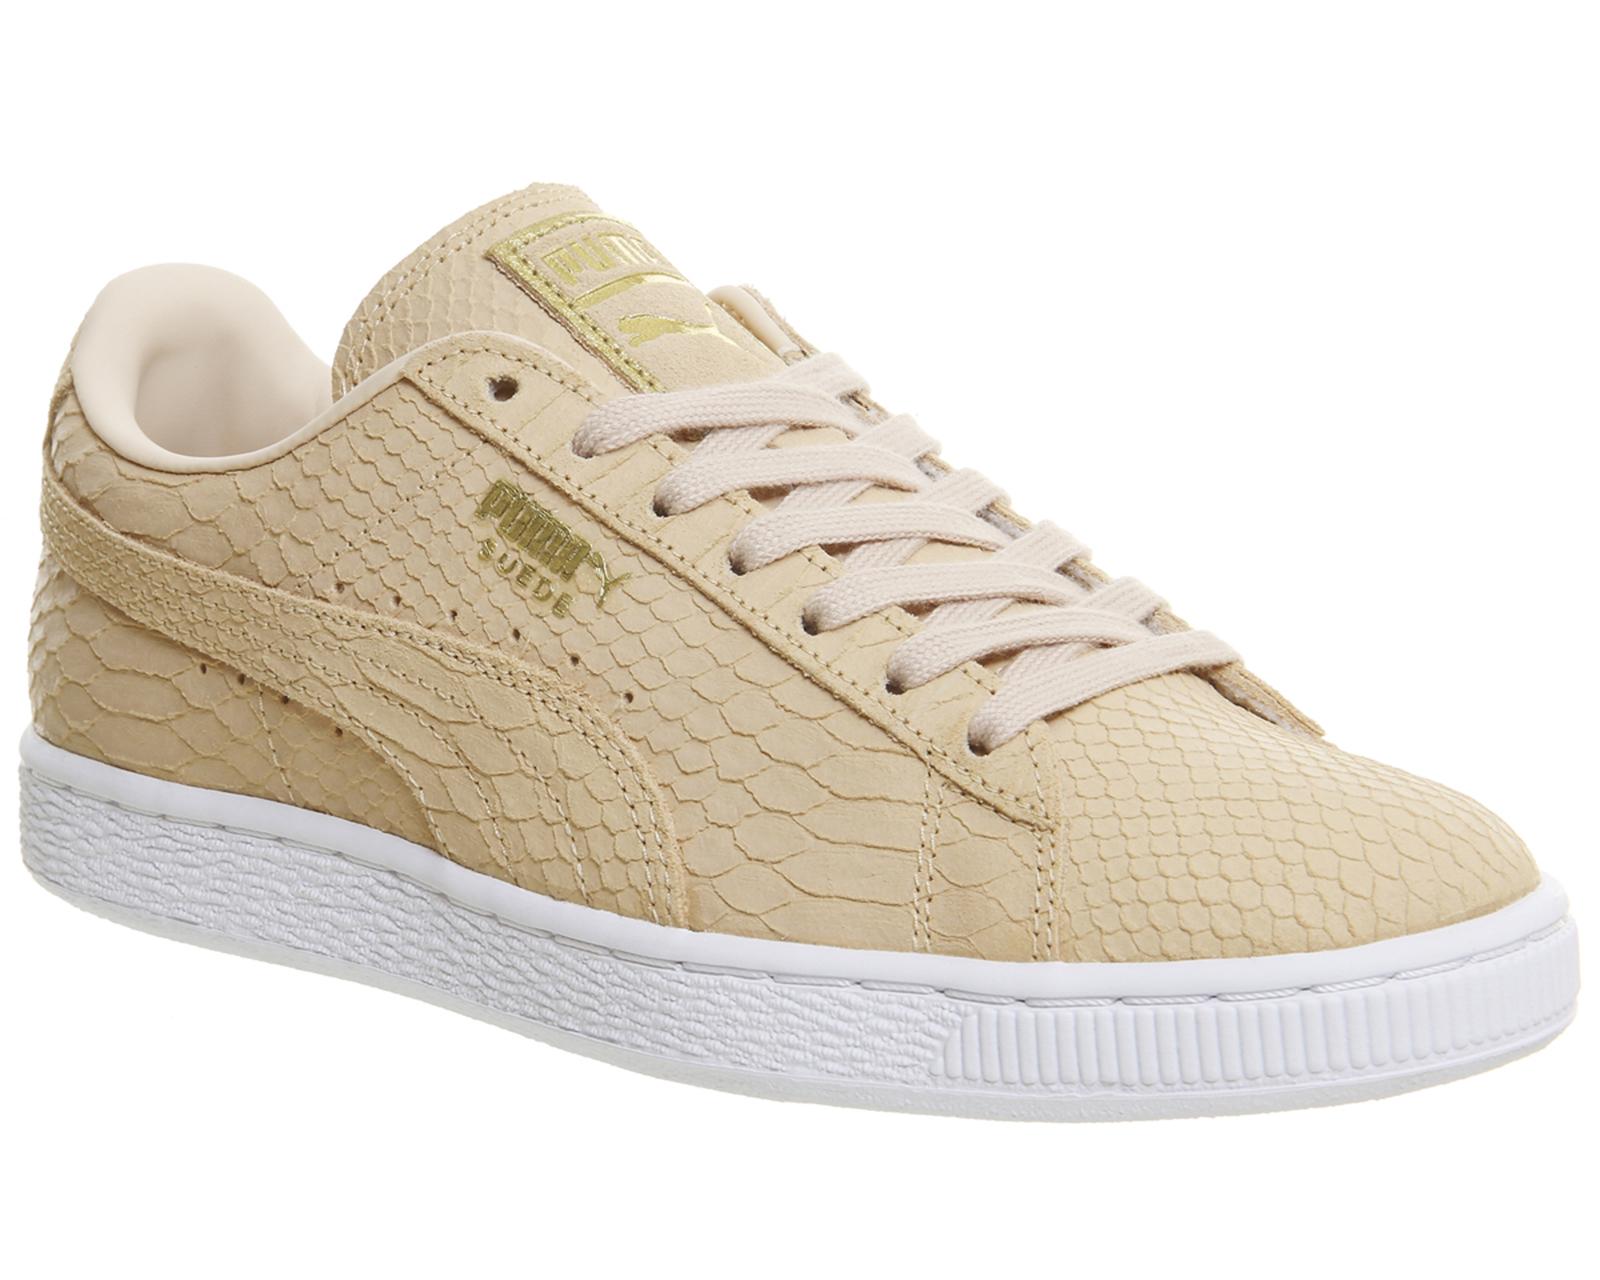 hot sale online e59eb 9e20a Details about Womens Puma Suede Classic NATURAL VACHETTA EXOTIC Trainers  Shoes